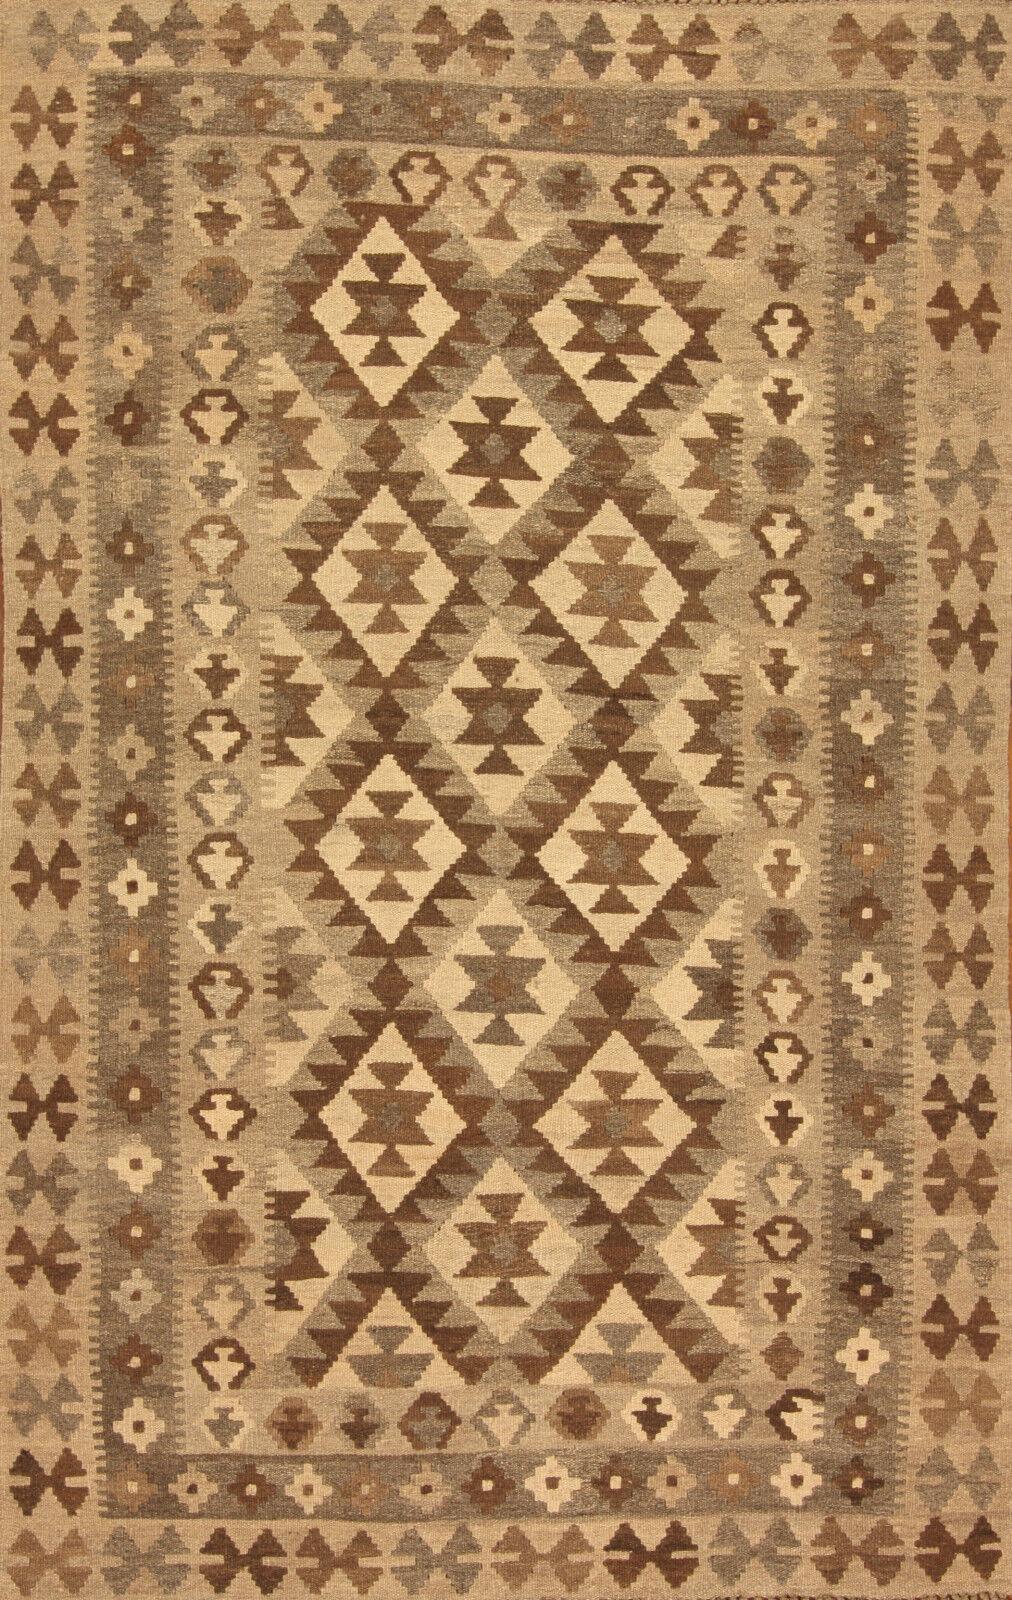 Orient alfombra handgewebter afganistán Kilim nº 315 (194 x 121) cm puente nuevo